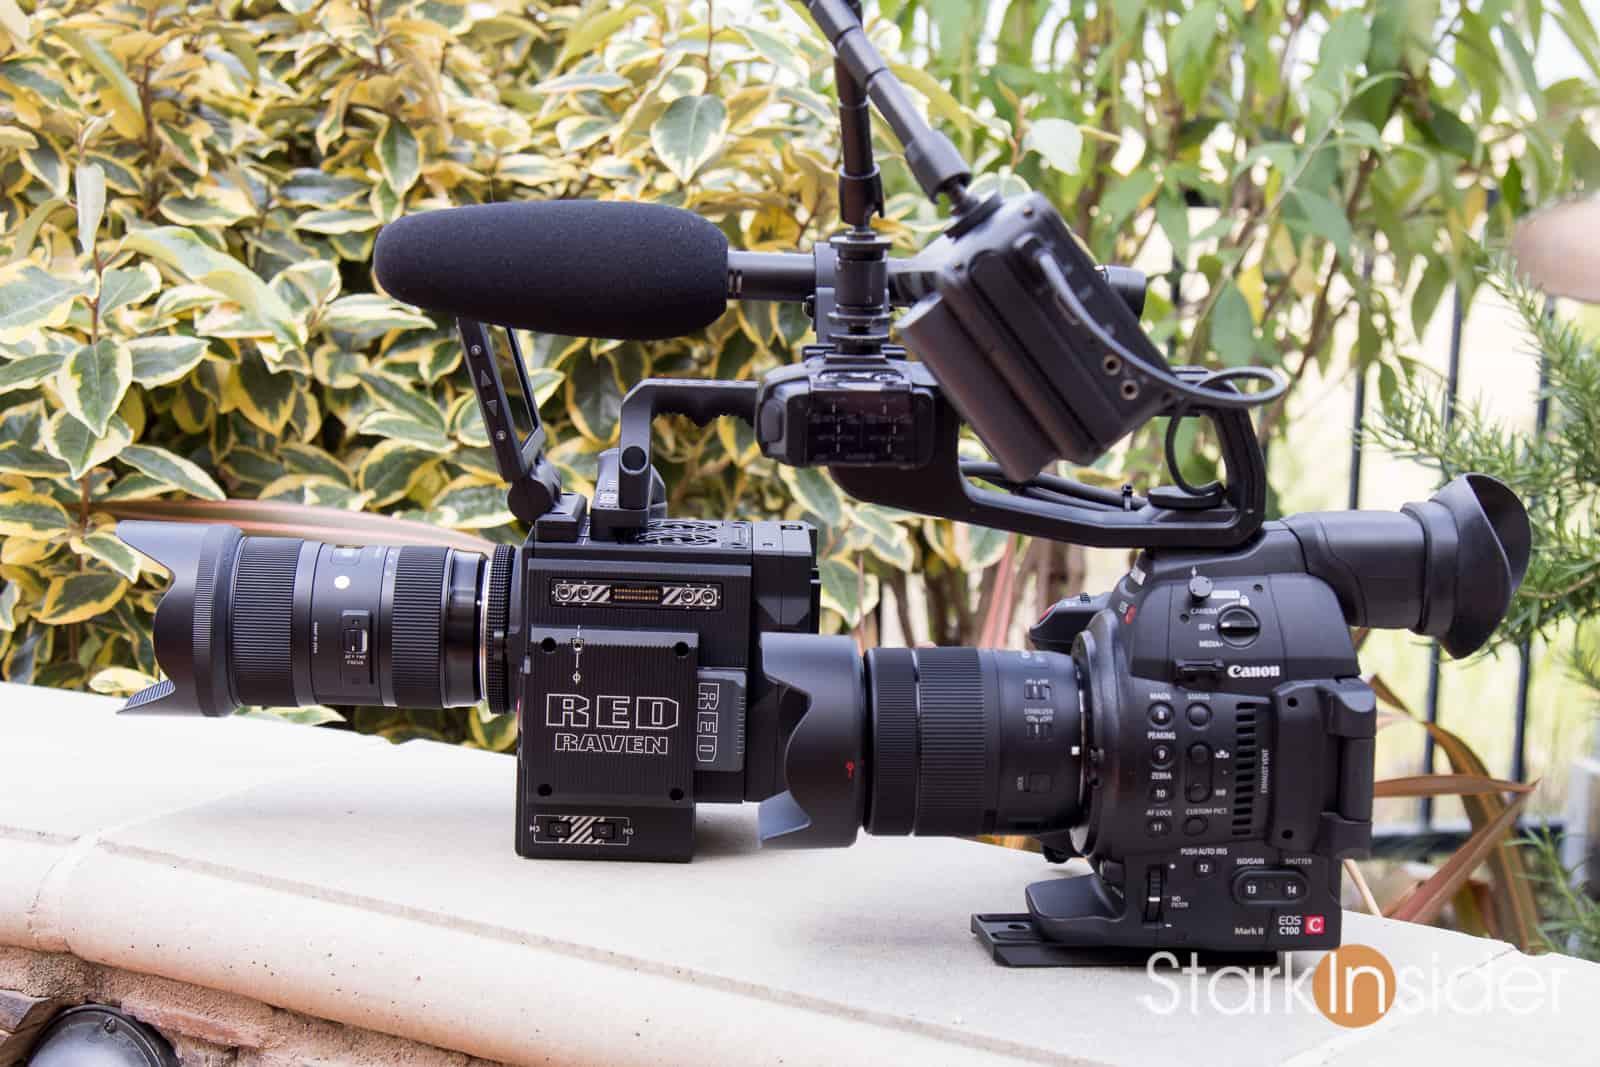 RED-Raven-Camera-Unboxing-Stark-Insider-8738